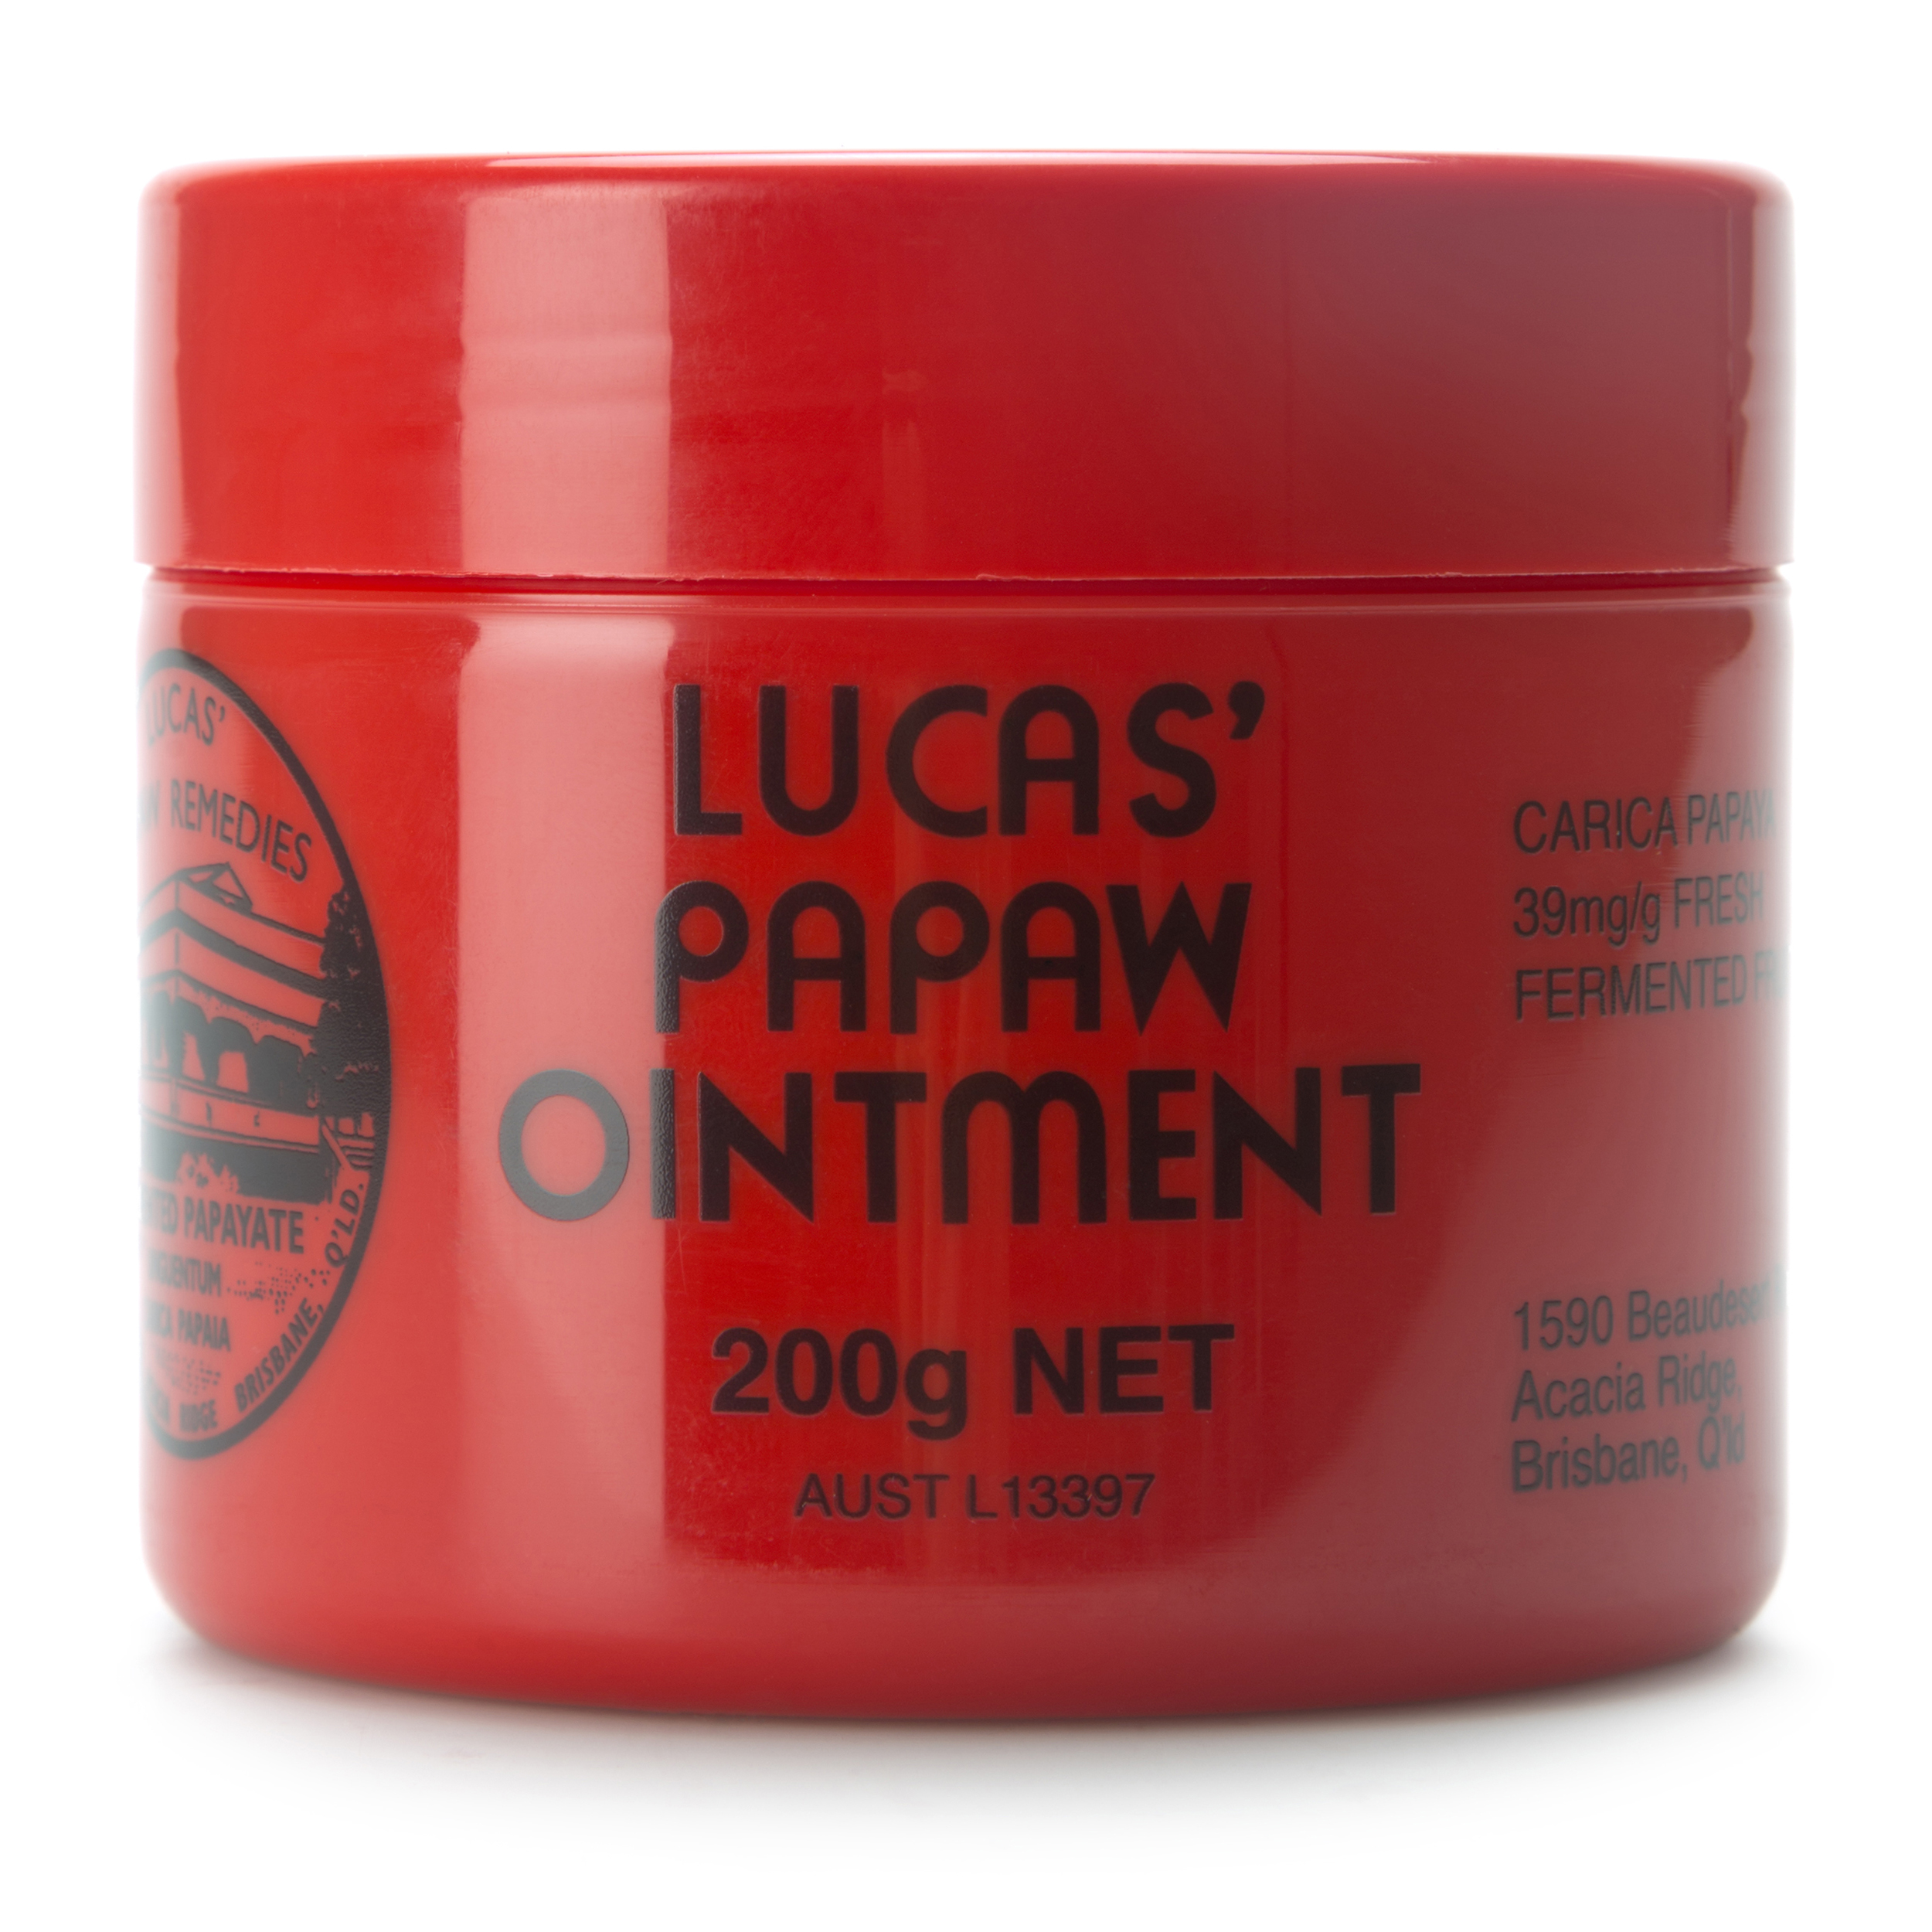 Lucas Papaw Бальзам для губ 200 гр фото